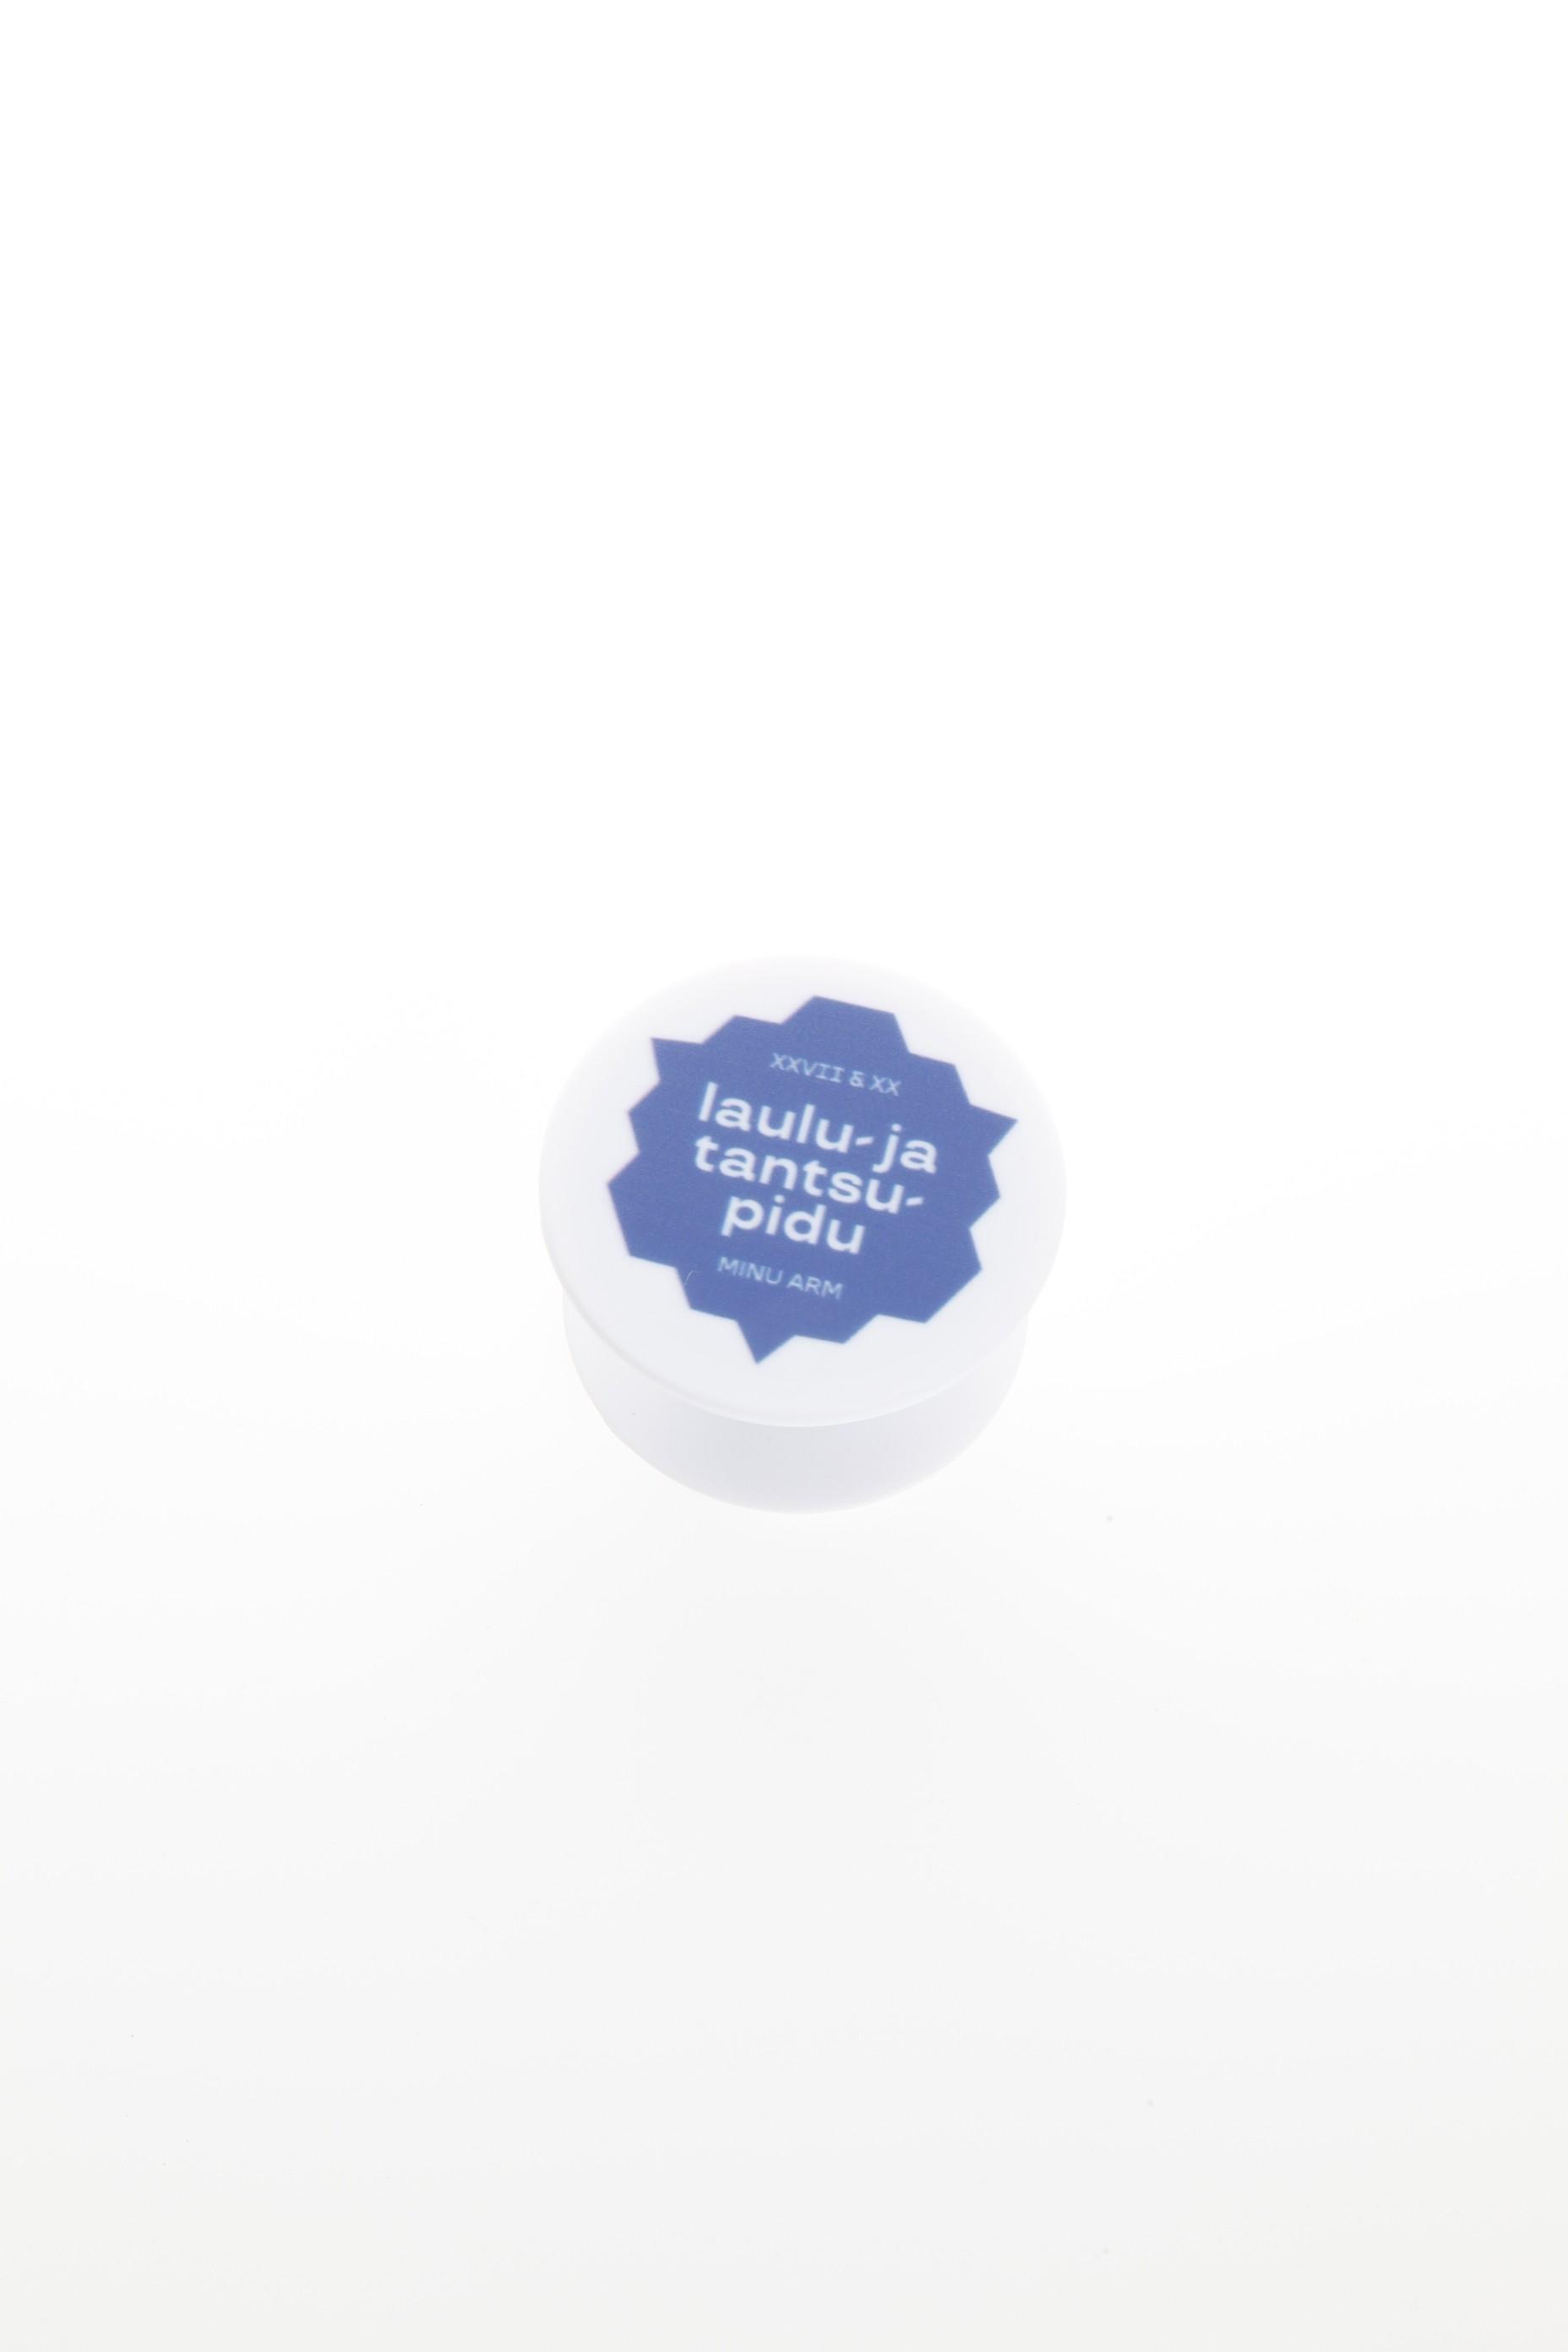 Blue PopSocket for a mobile phone